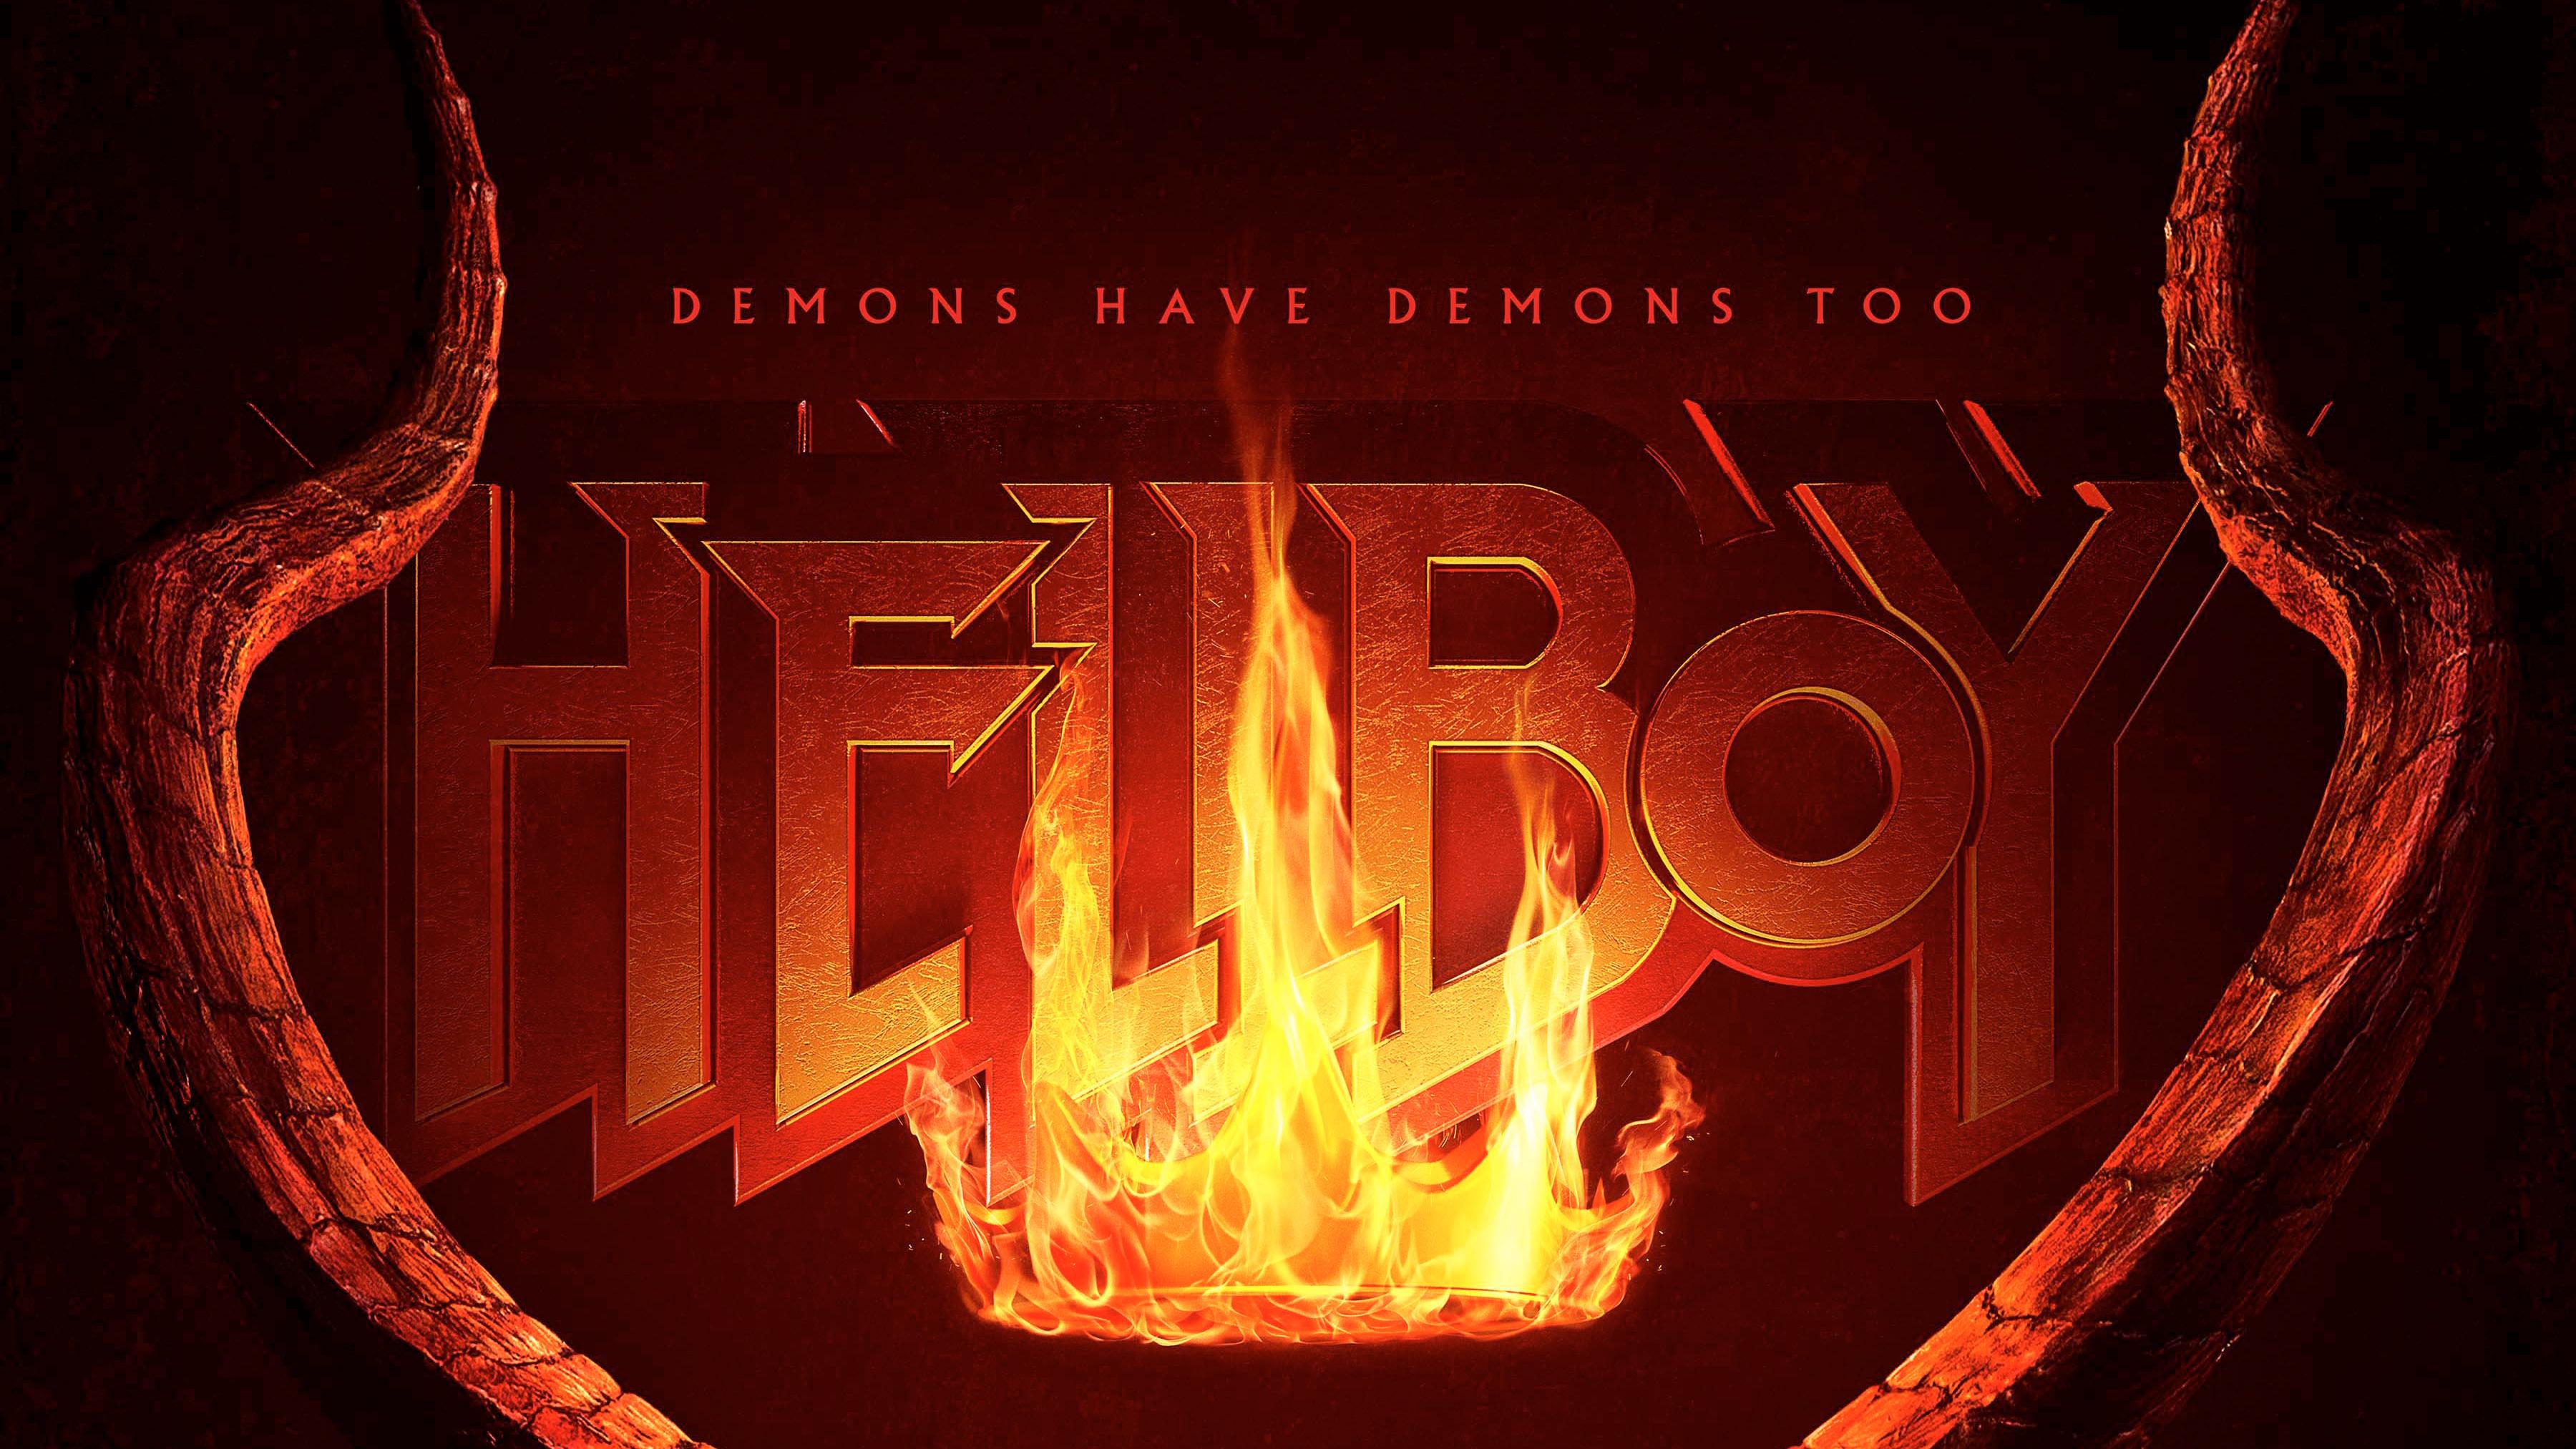 hellboy 2019 movie logo 1545866177 - Hellboy 2019 Movie Logo 4k - movies wallpapers, logo wallpapers, hellboy wallpapers, hd-wallpapers, 4k-wallpapers, 2019 movies wallpapers